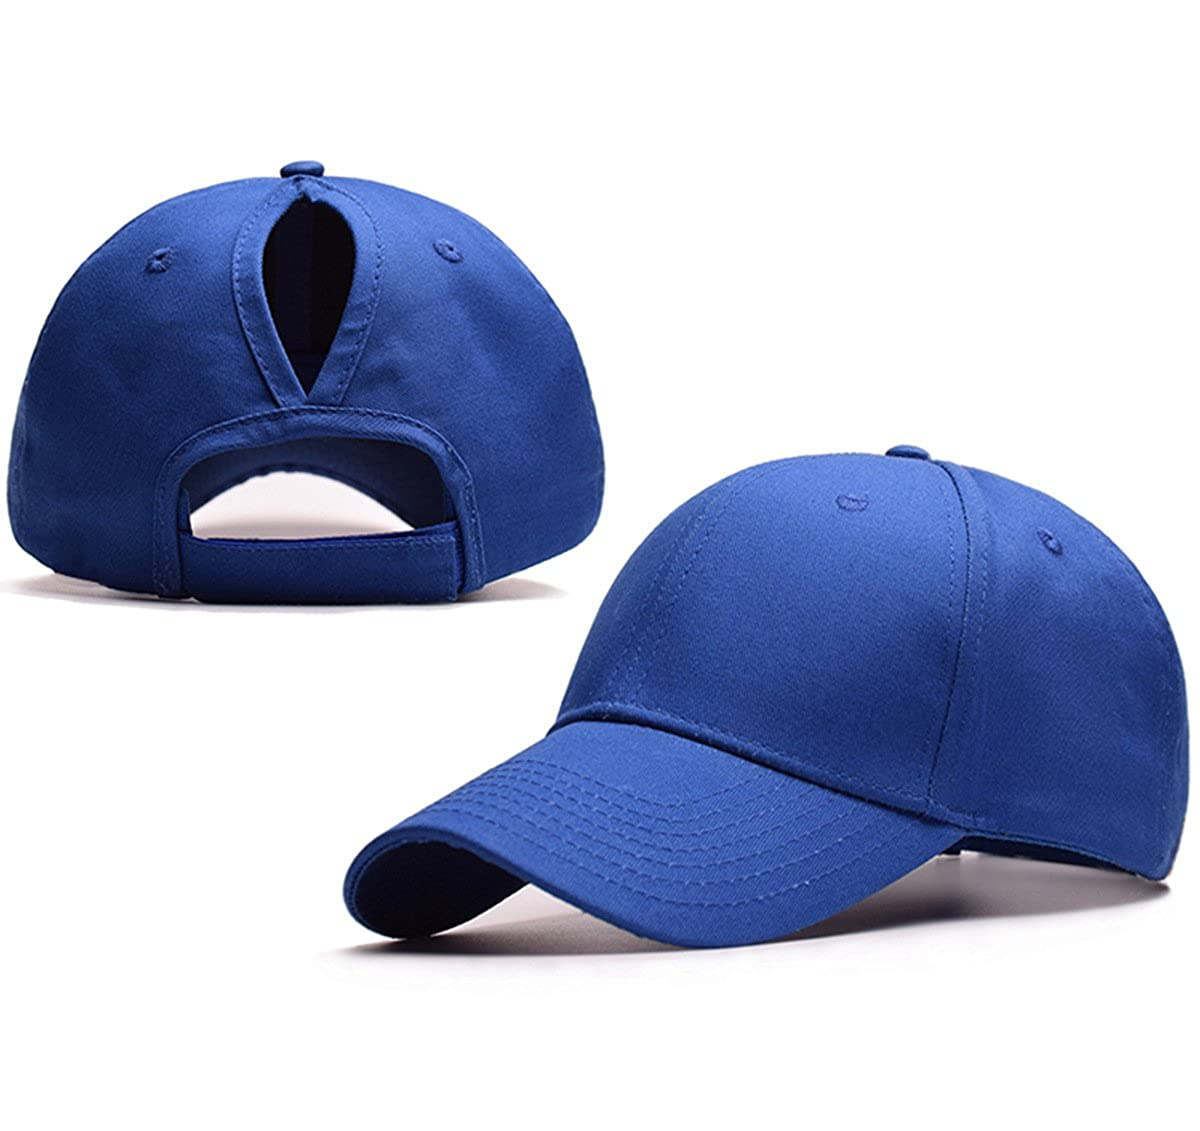 0a4e93e17 JAKY Global Ponytail Baseball Cap Women Messy Bun Adjustable Mesh Trucker  Cotton Hats: Amazon.co.uk: Clothing